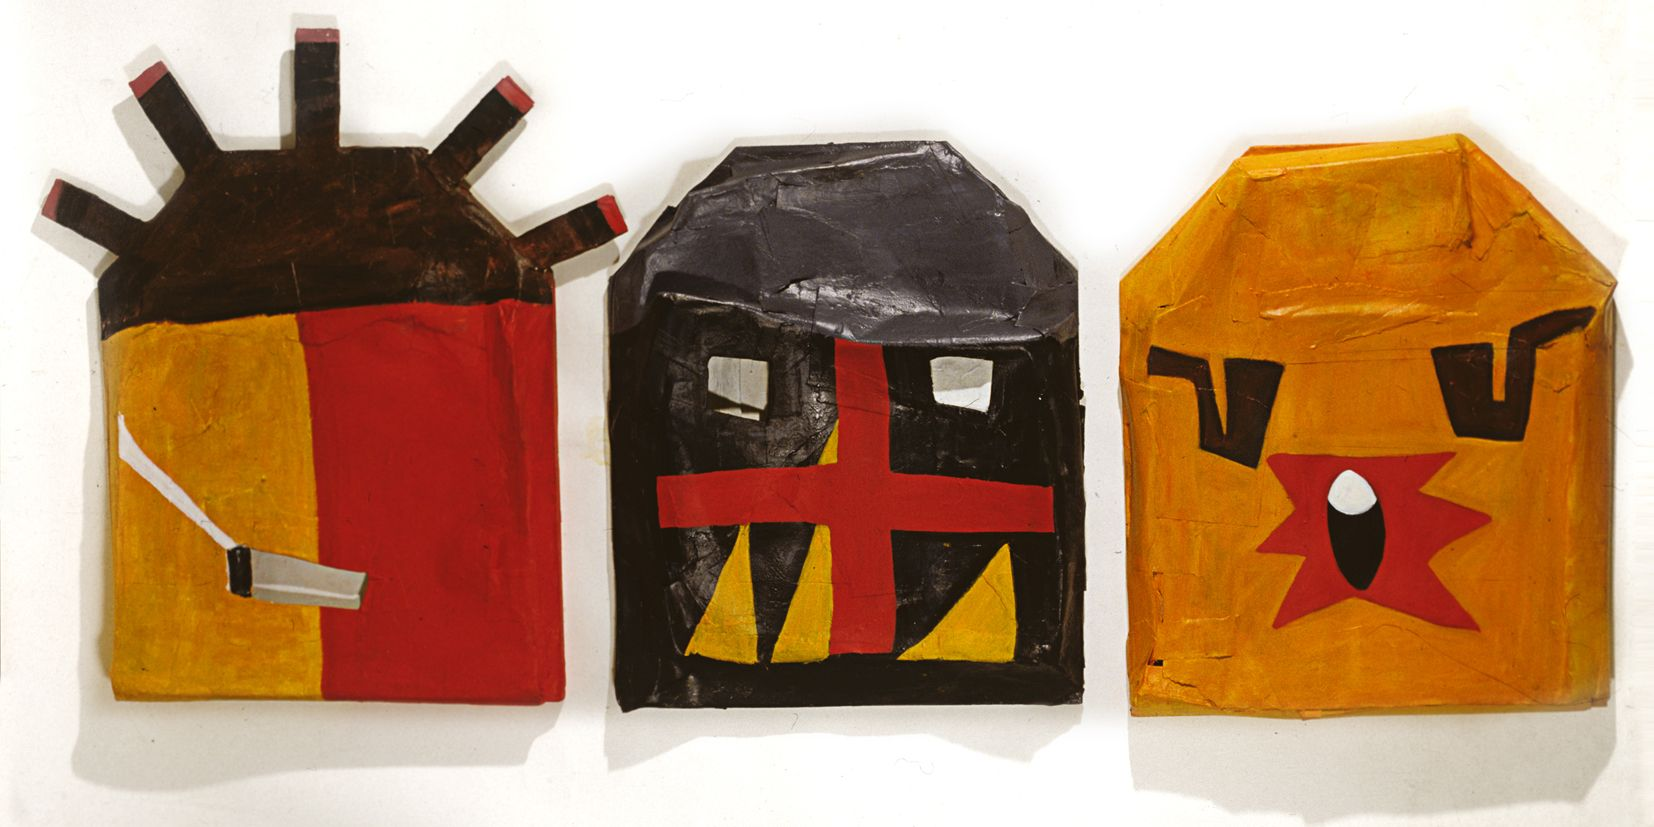 ARTTABAC, 1991, cm.260x140x10, tecnica mista su legno